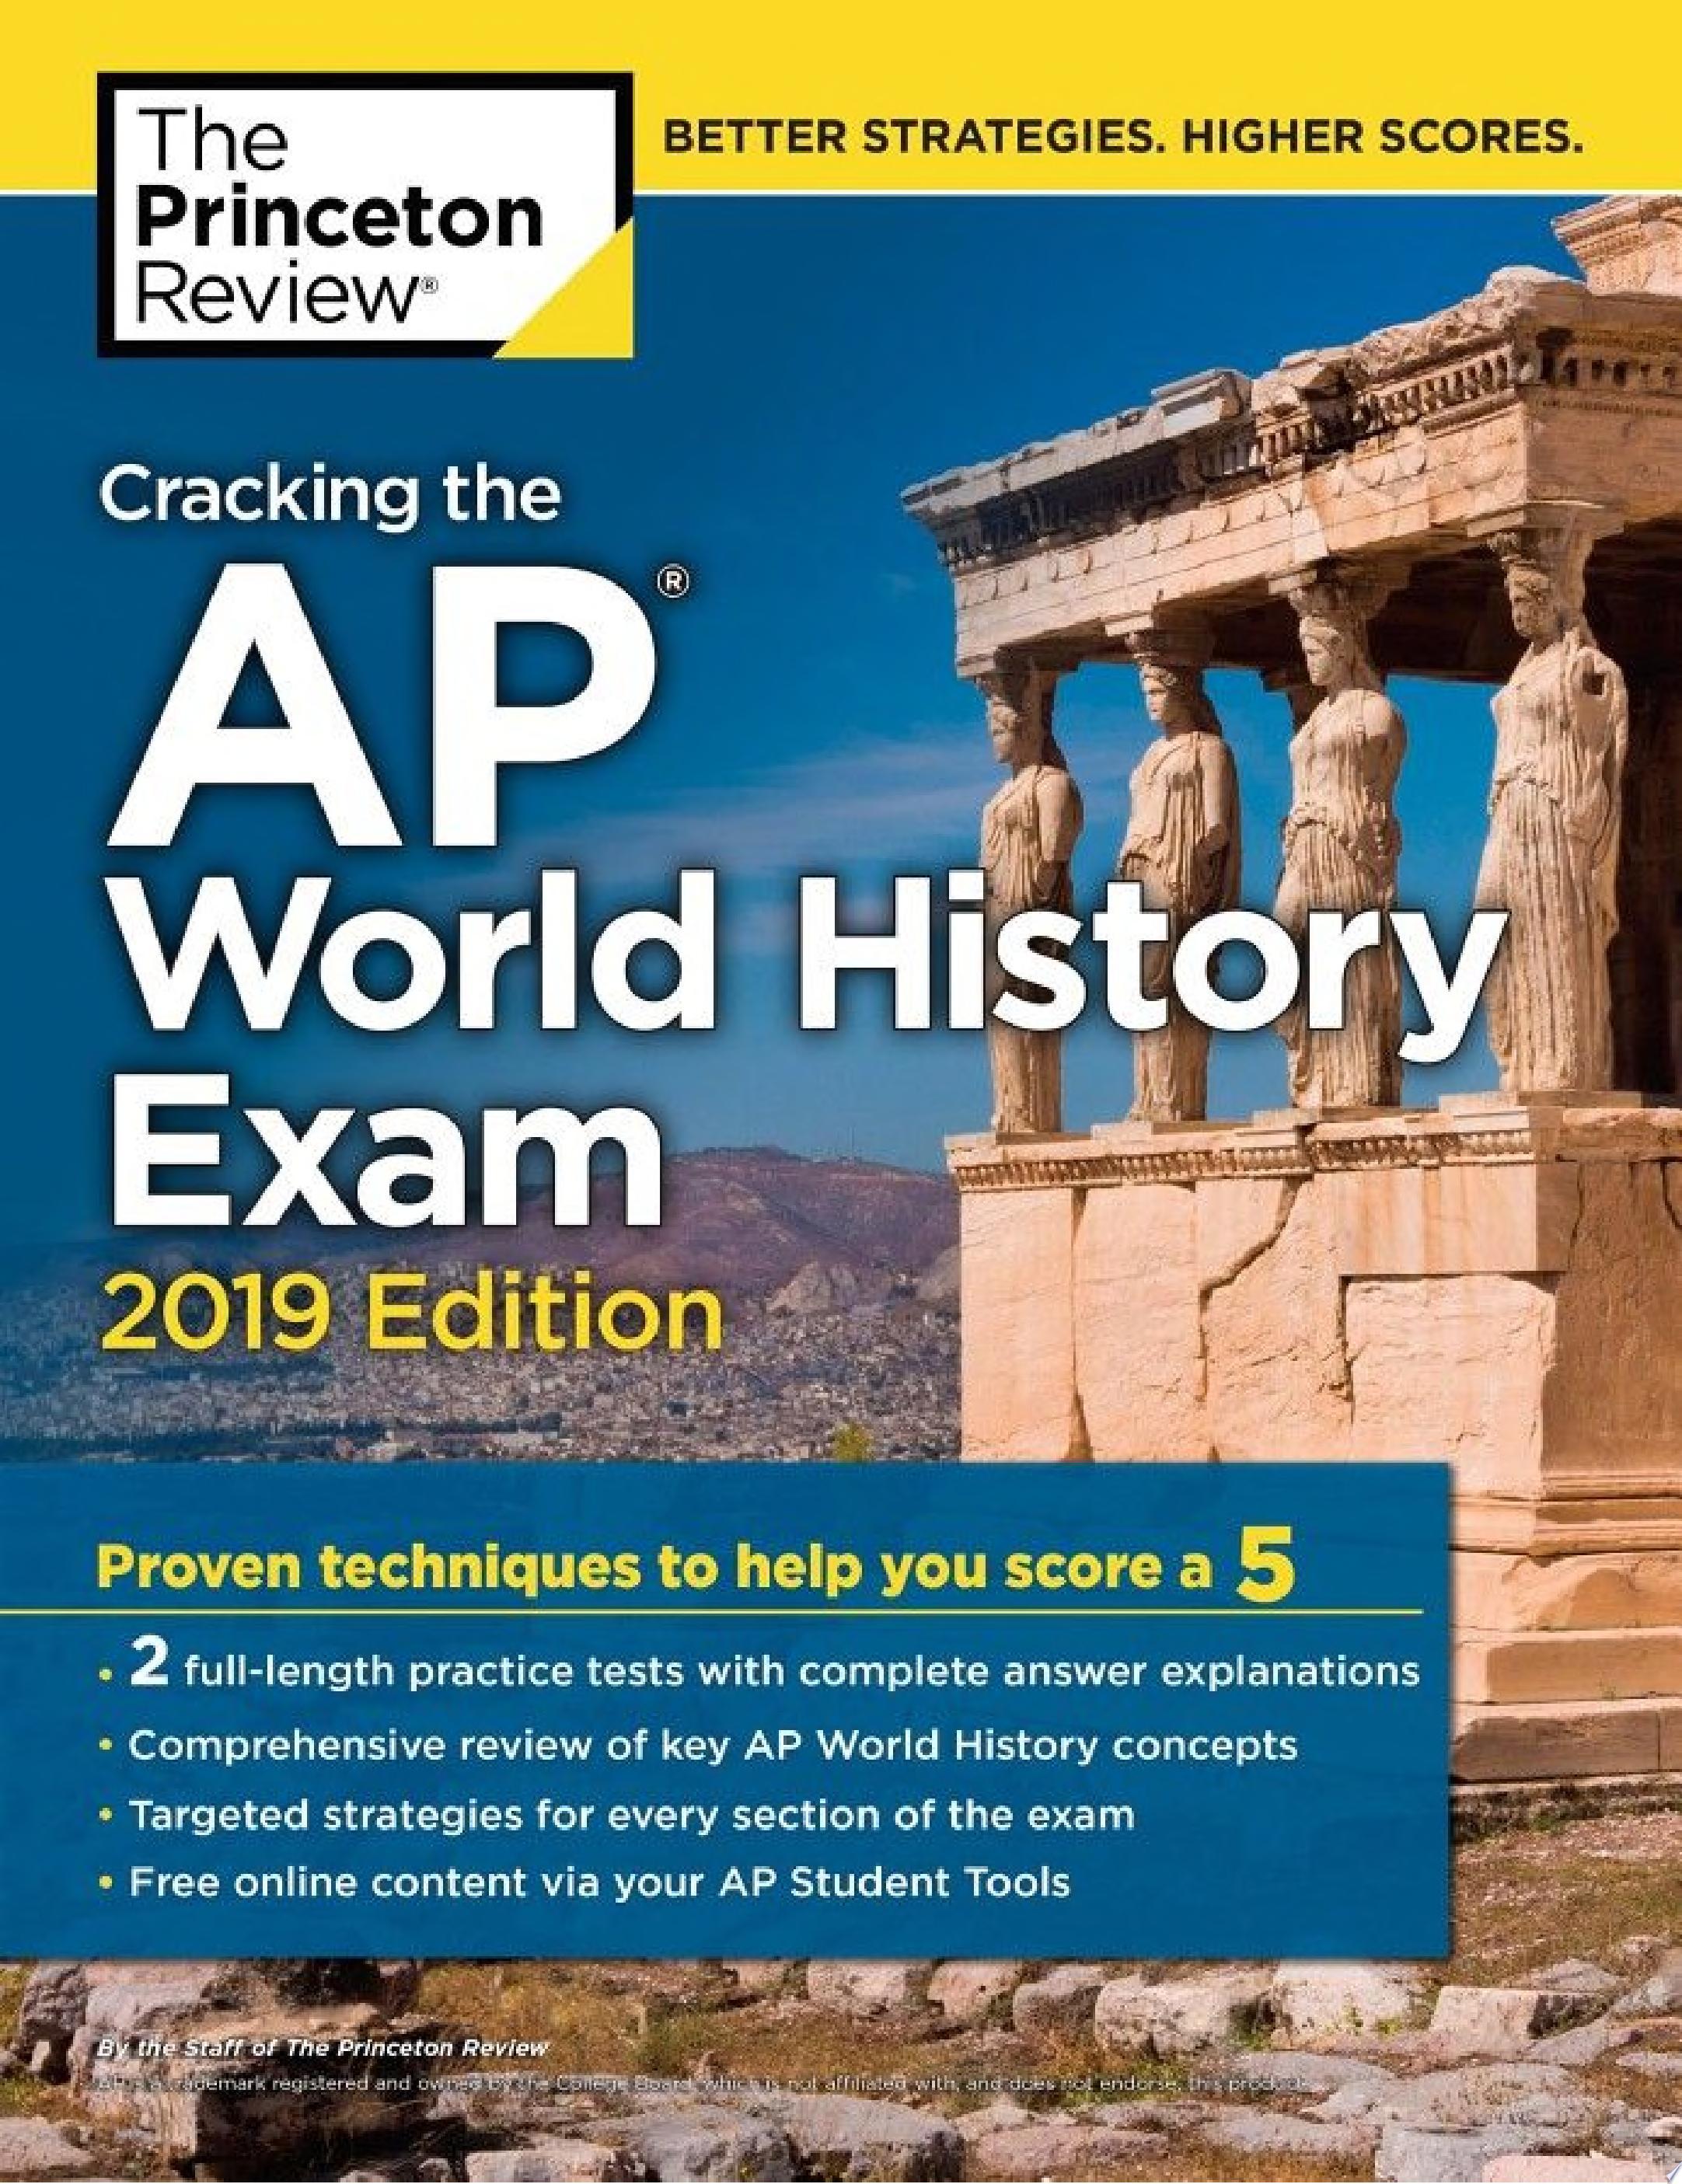 Cracking the AP World History Exam, 2019 Edition